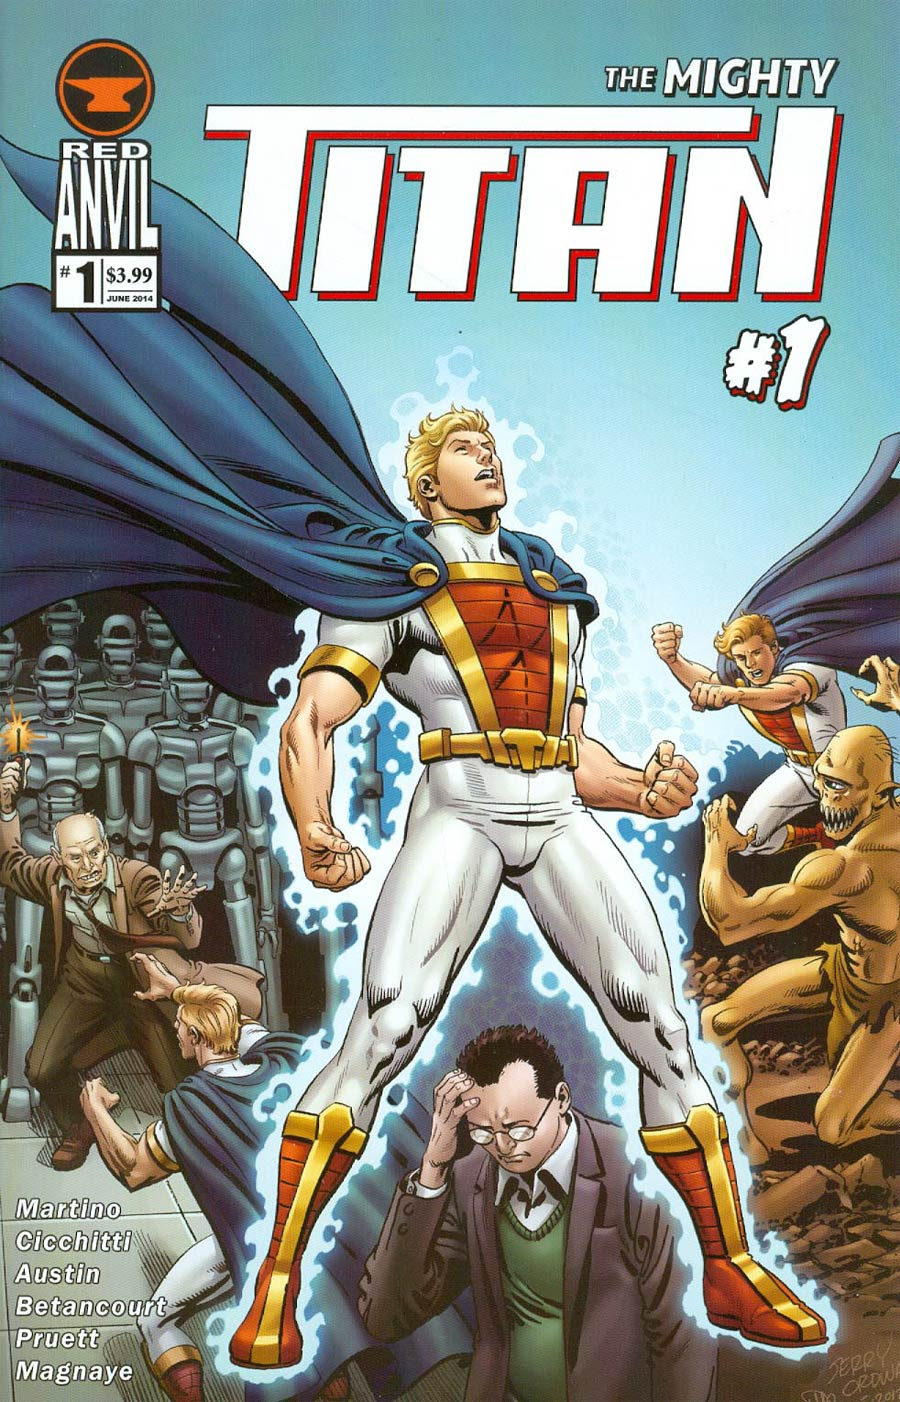 Mighty Titan #1